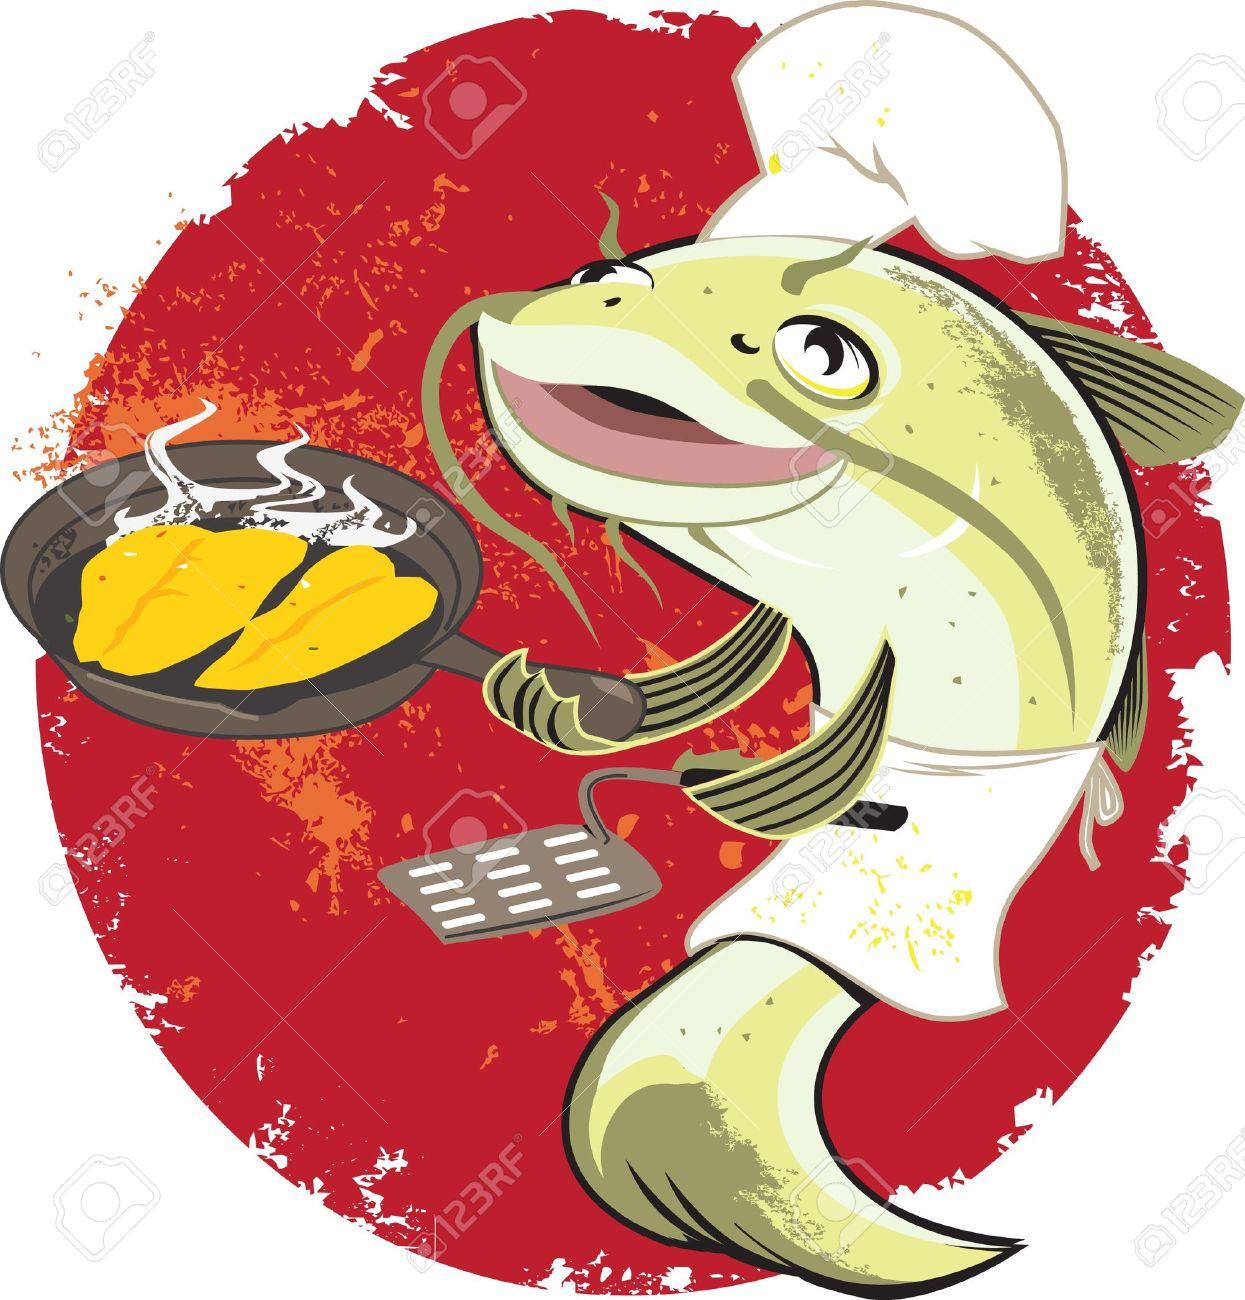 Catfish Fry Cook Stock Vector - 12891037